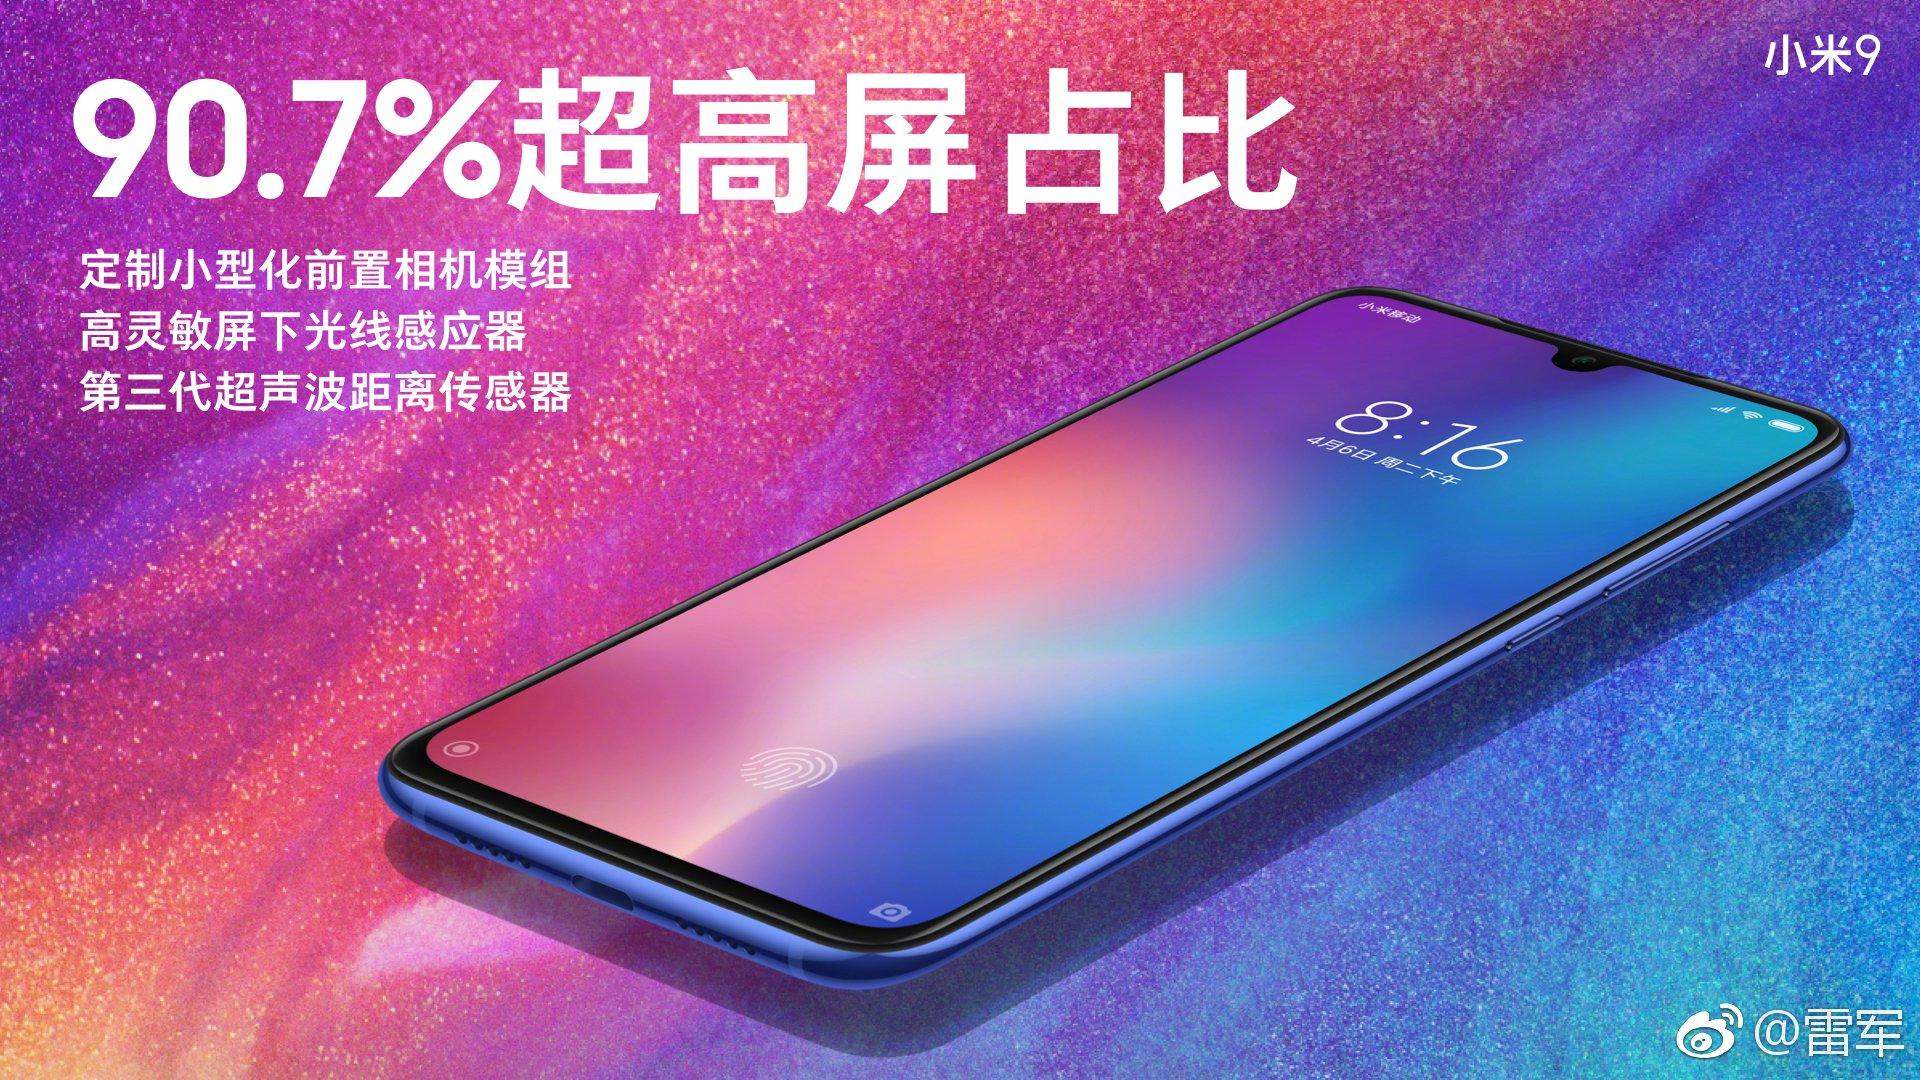 Xiaomi Mi 9 Screen to body Ratio